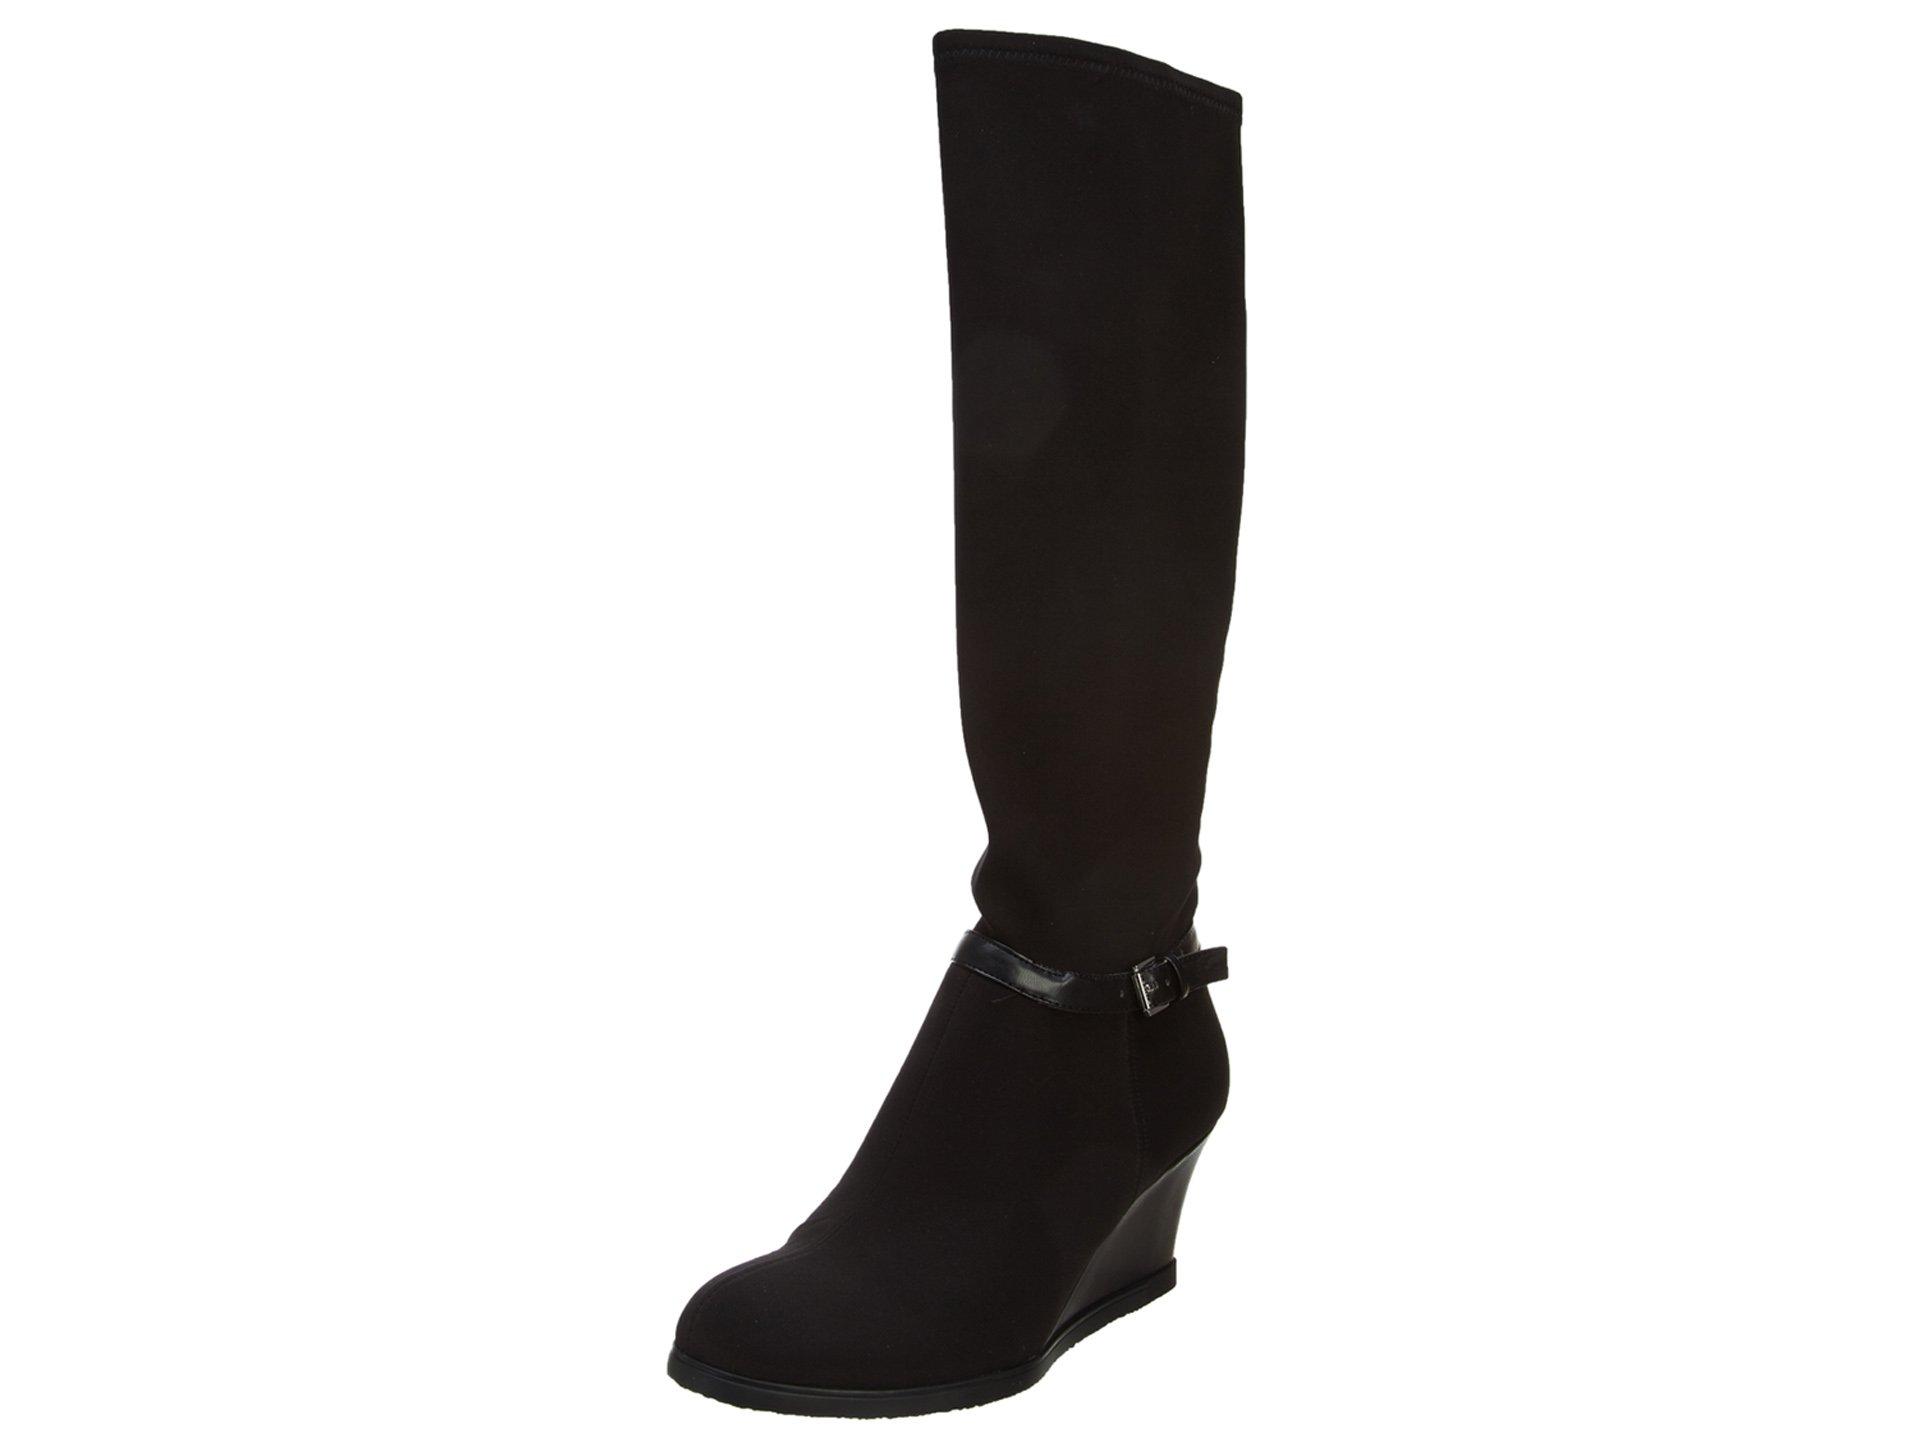 Ralph Lauren Tula Tall Wedge Boots - Black - Womens - 9.5